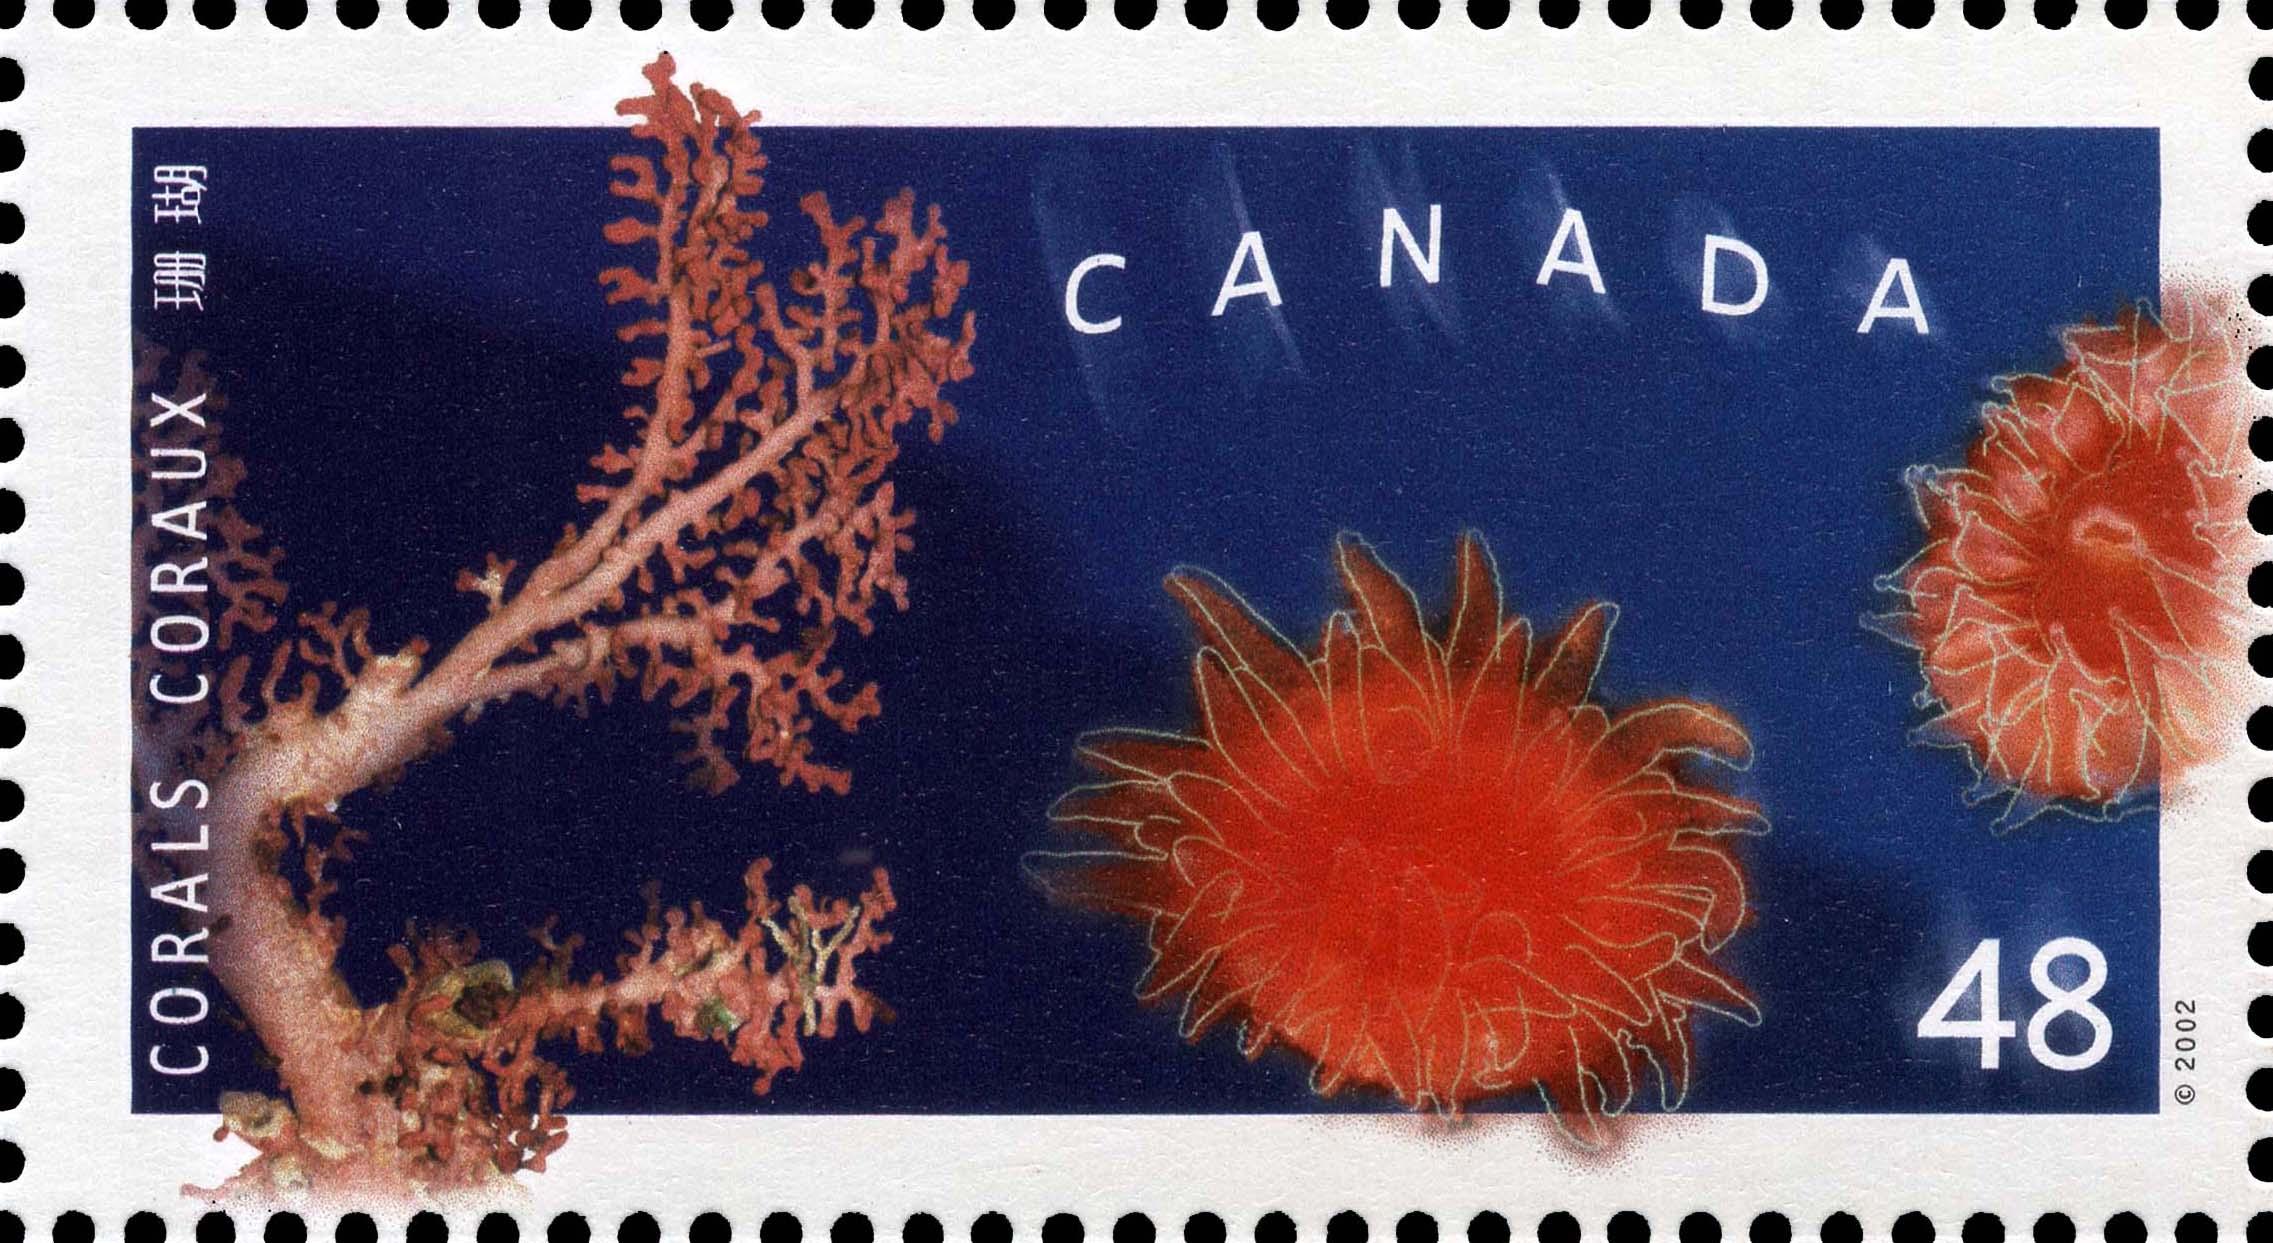 Paragorgia arborea, Balanophyllia elegans and Carophylliaalaskensis Canada Postage Stamp | Corals